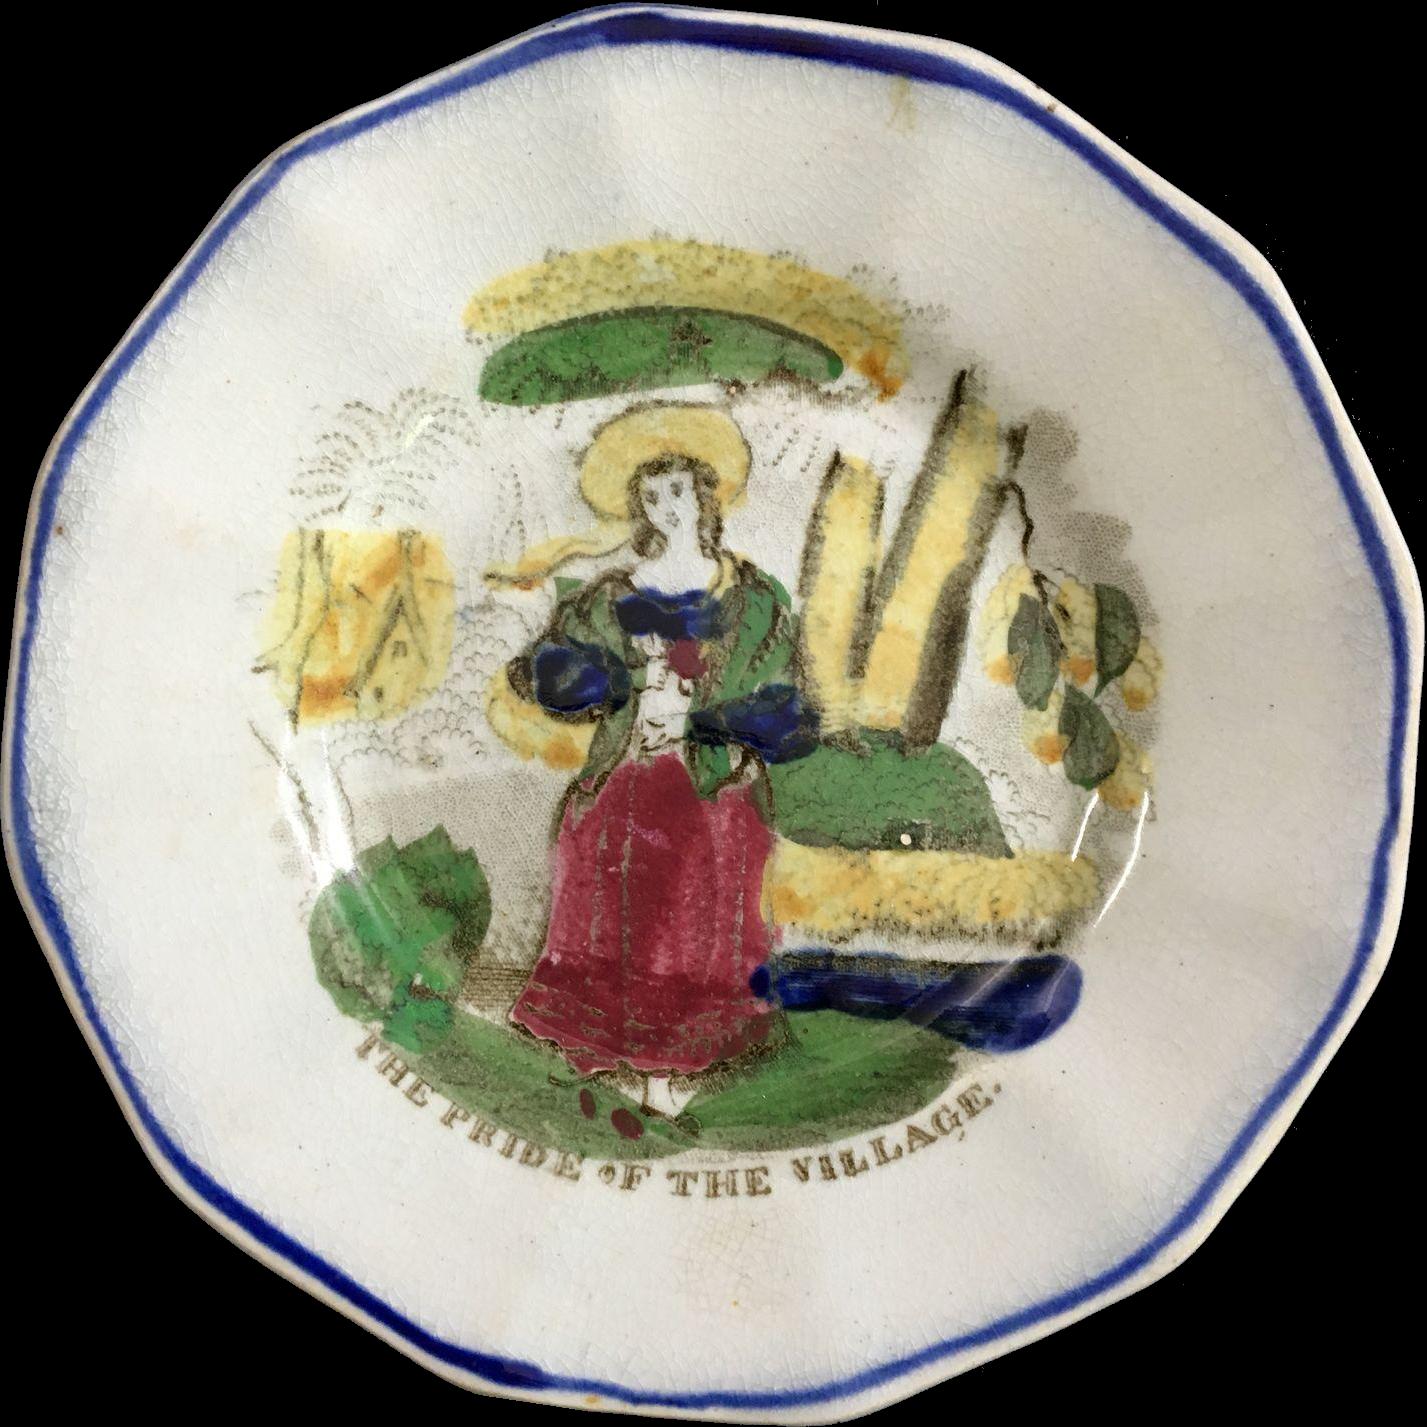 THE PRIDE OF THE VILLAGE, English Staffordshire Transferware Child's Plate 1840